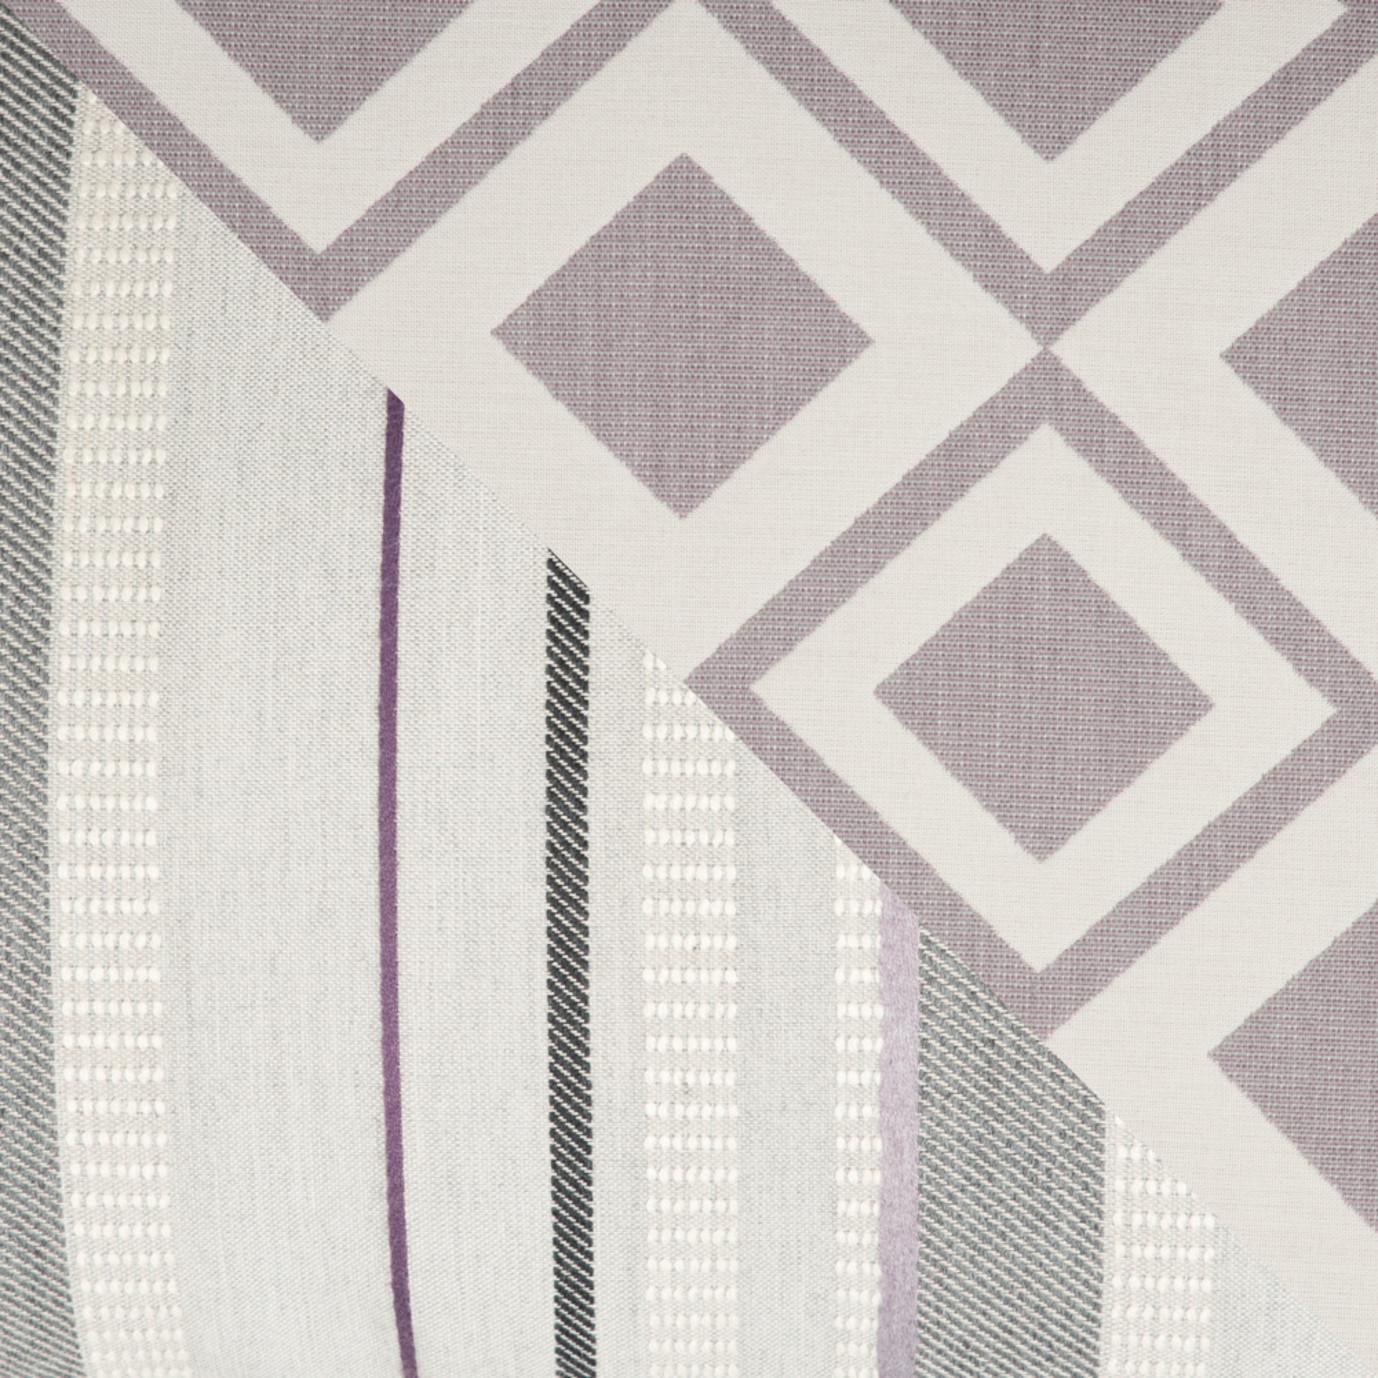 Deco™ Motion Club Chairs - Wisteria Lavender